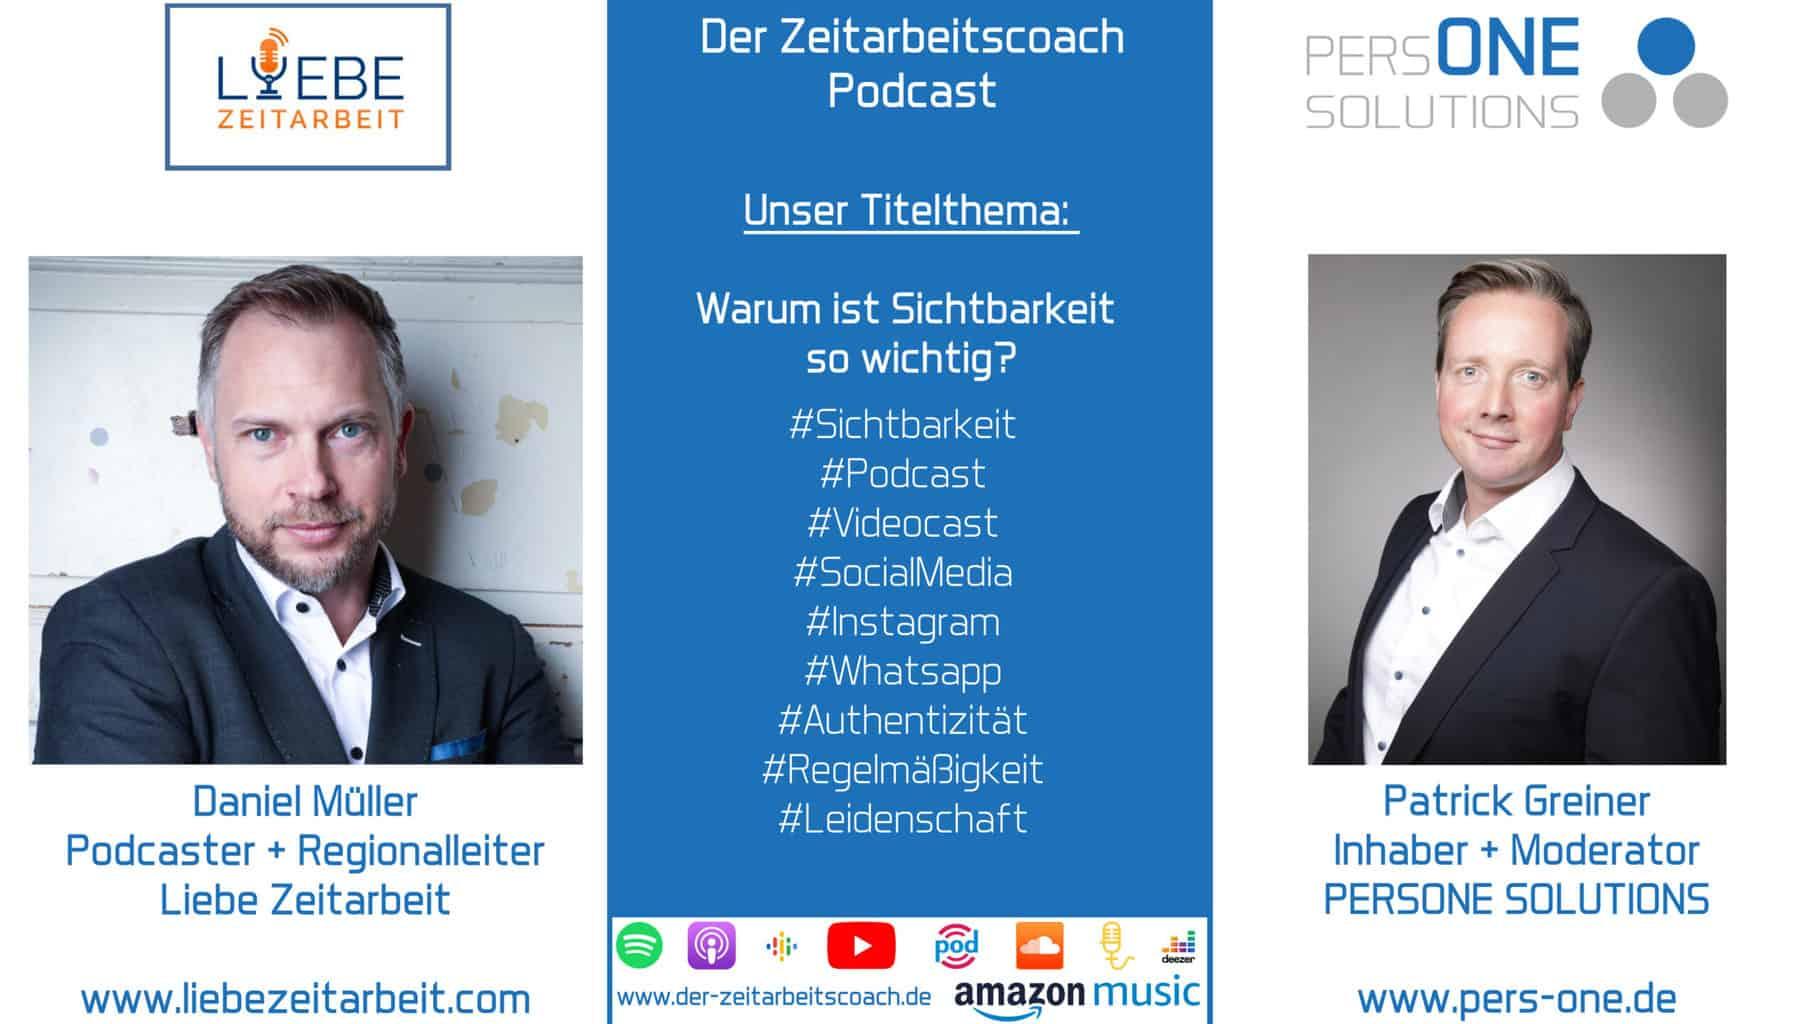 Müller, Daniel_Juni Jour Fixe_Podcast YT Grafik-Interview_Zeitarbeitscoach-Podcast